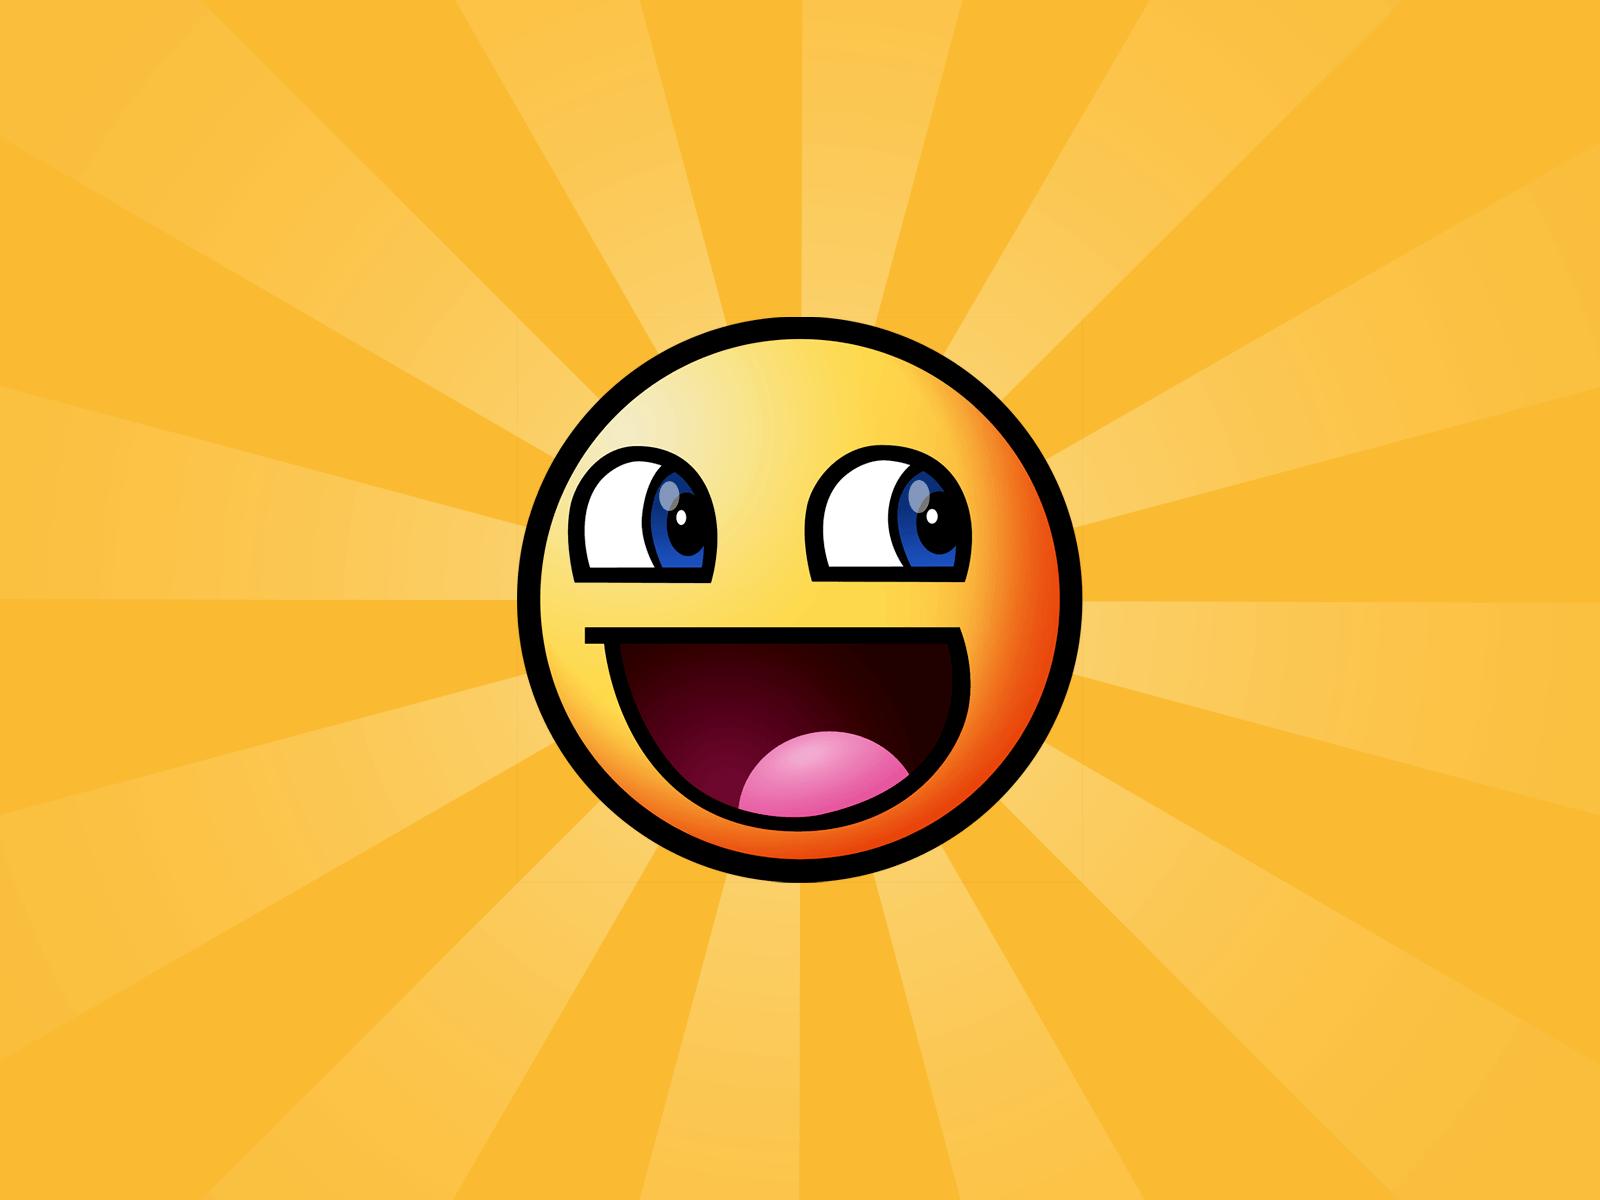 Top 20 Smiley Face Wallpaper: Smiley Face Wallpapers